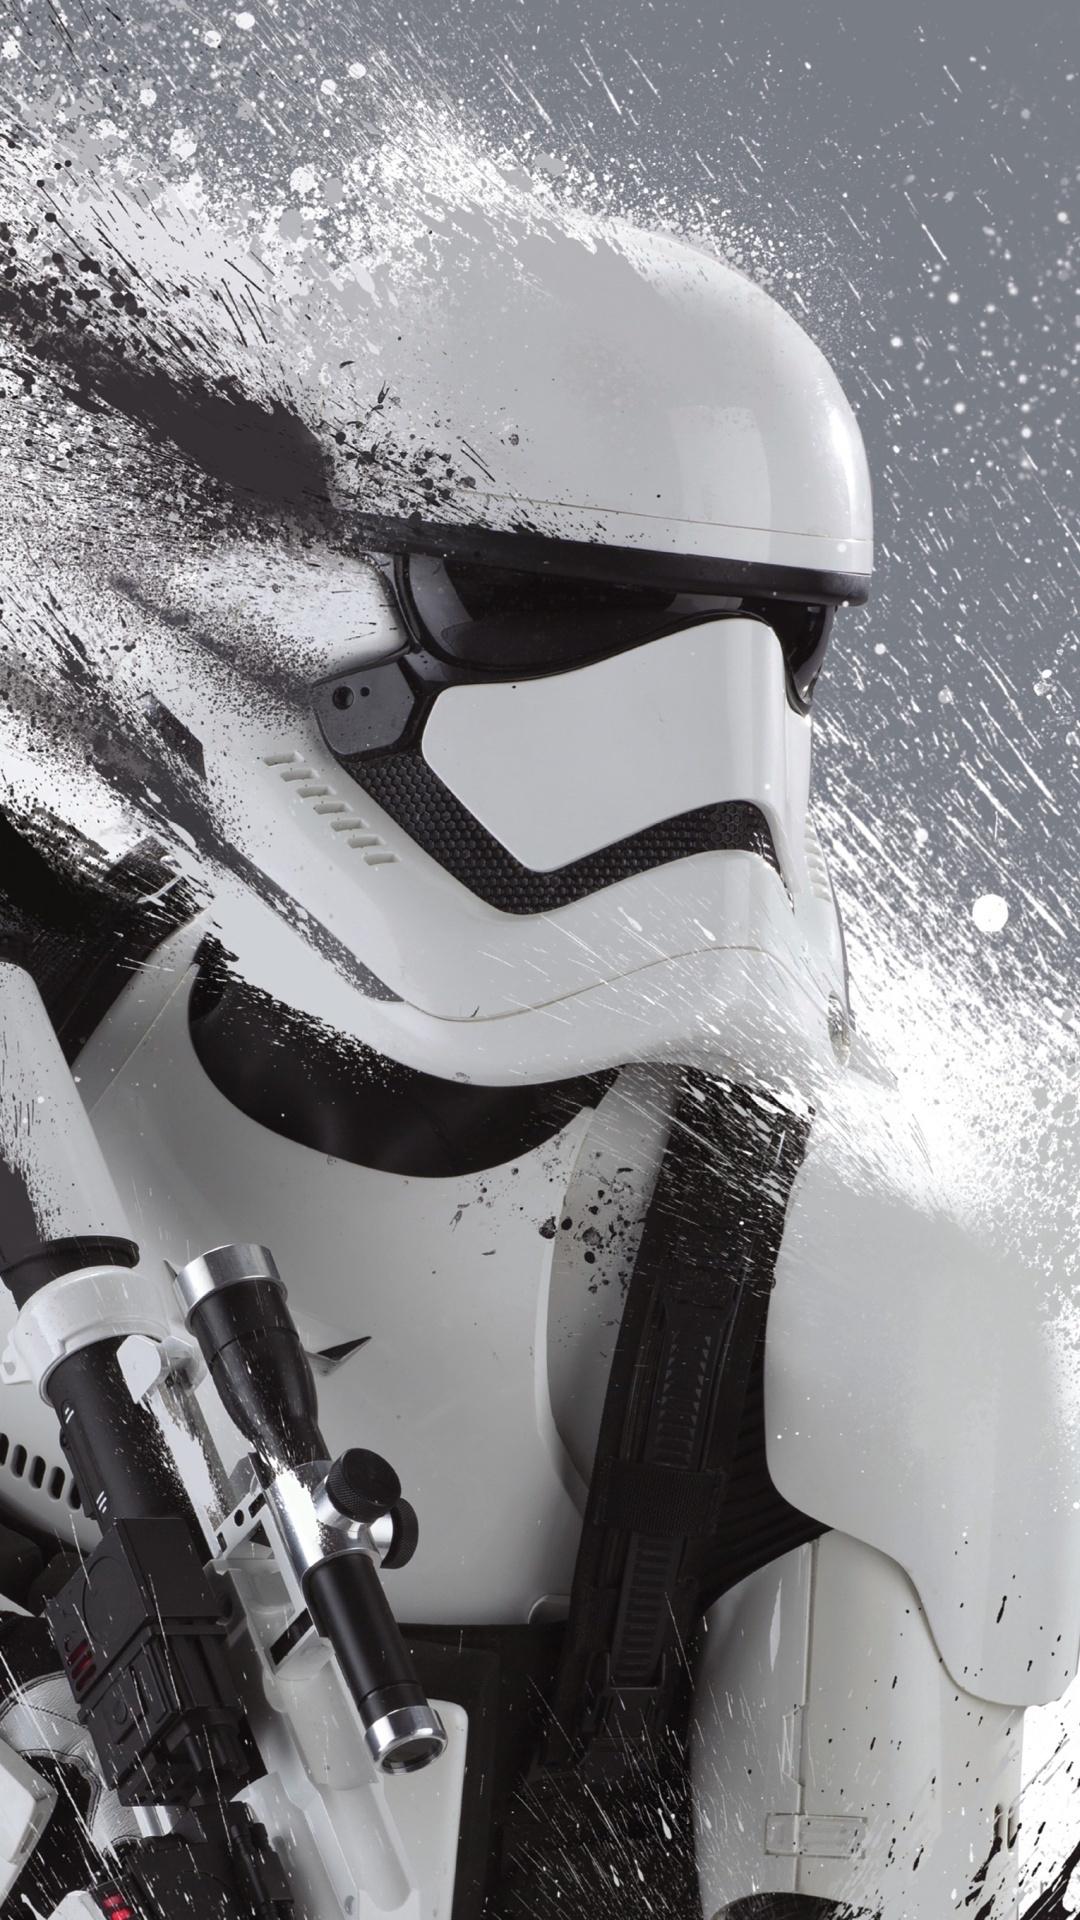 48 Star Wars The Force Awakens Iphone Wallpaper On Wallpapersafari